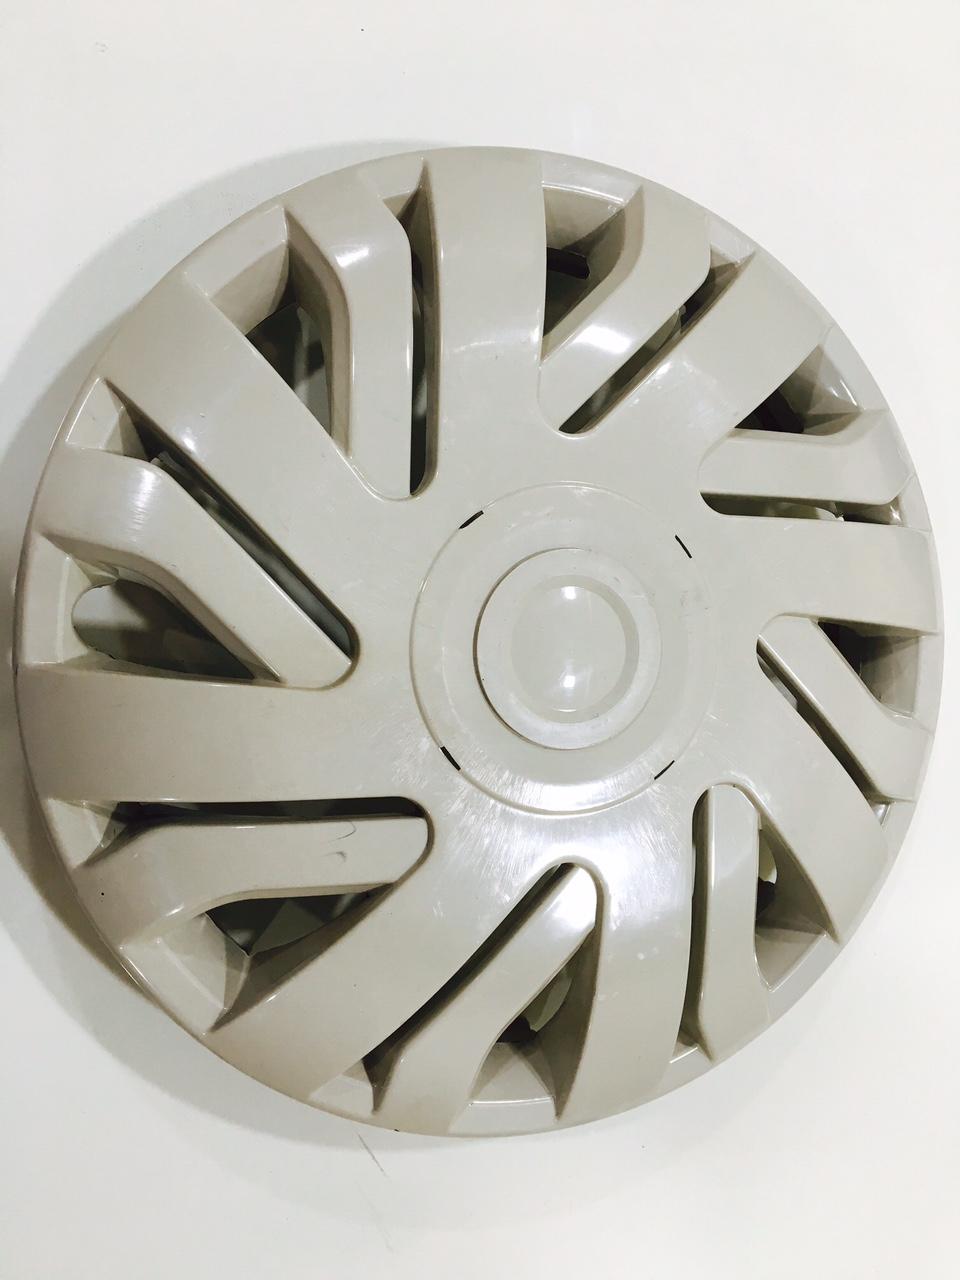 Mahindra Bolero - Wheel Cap1